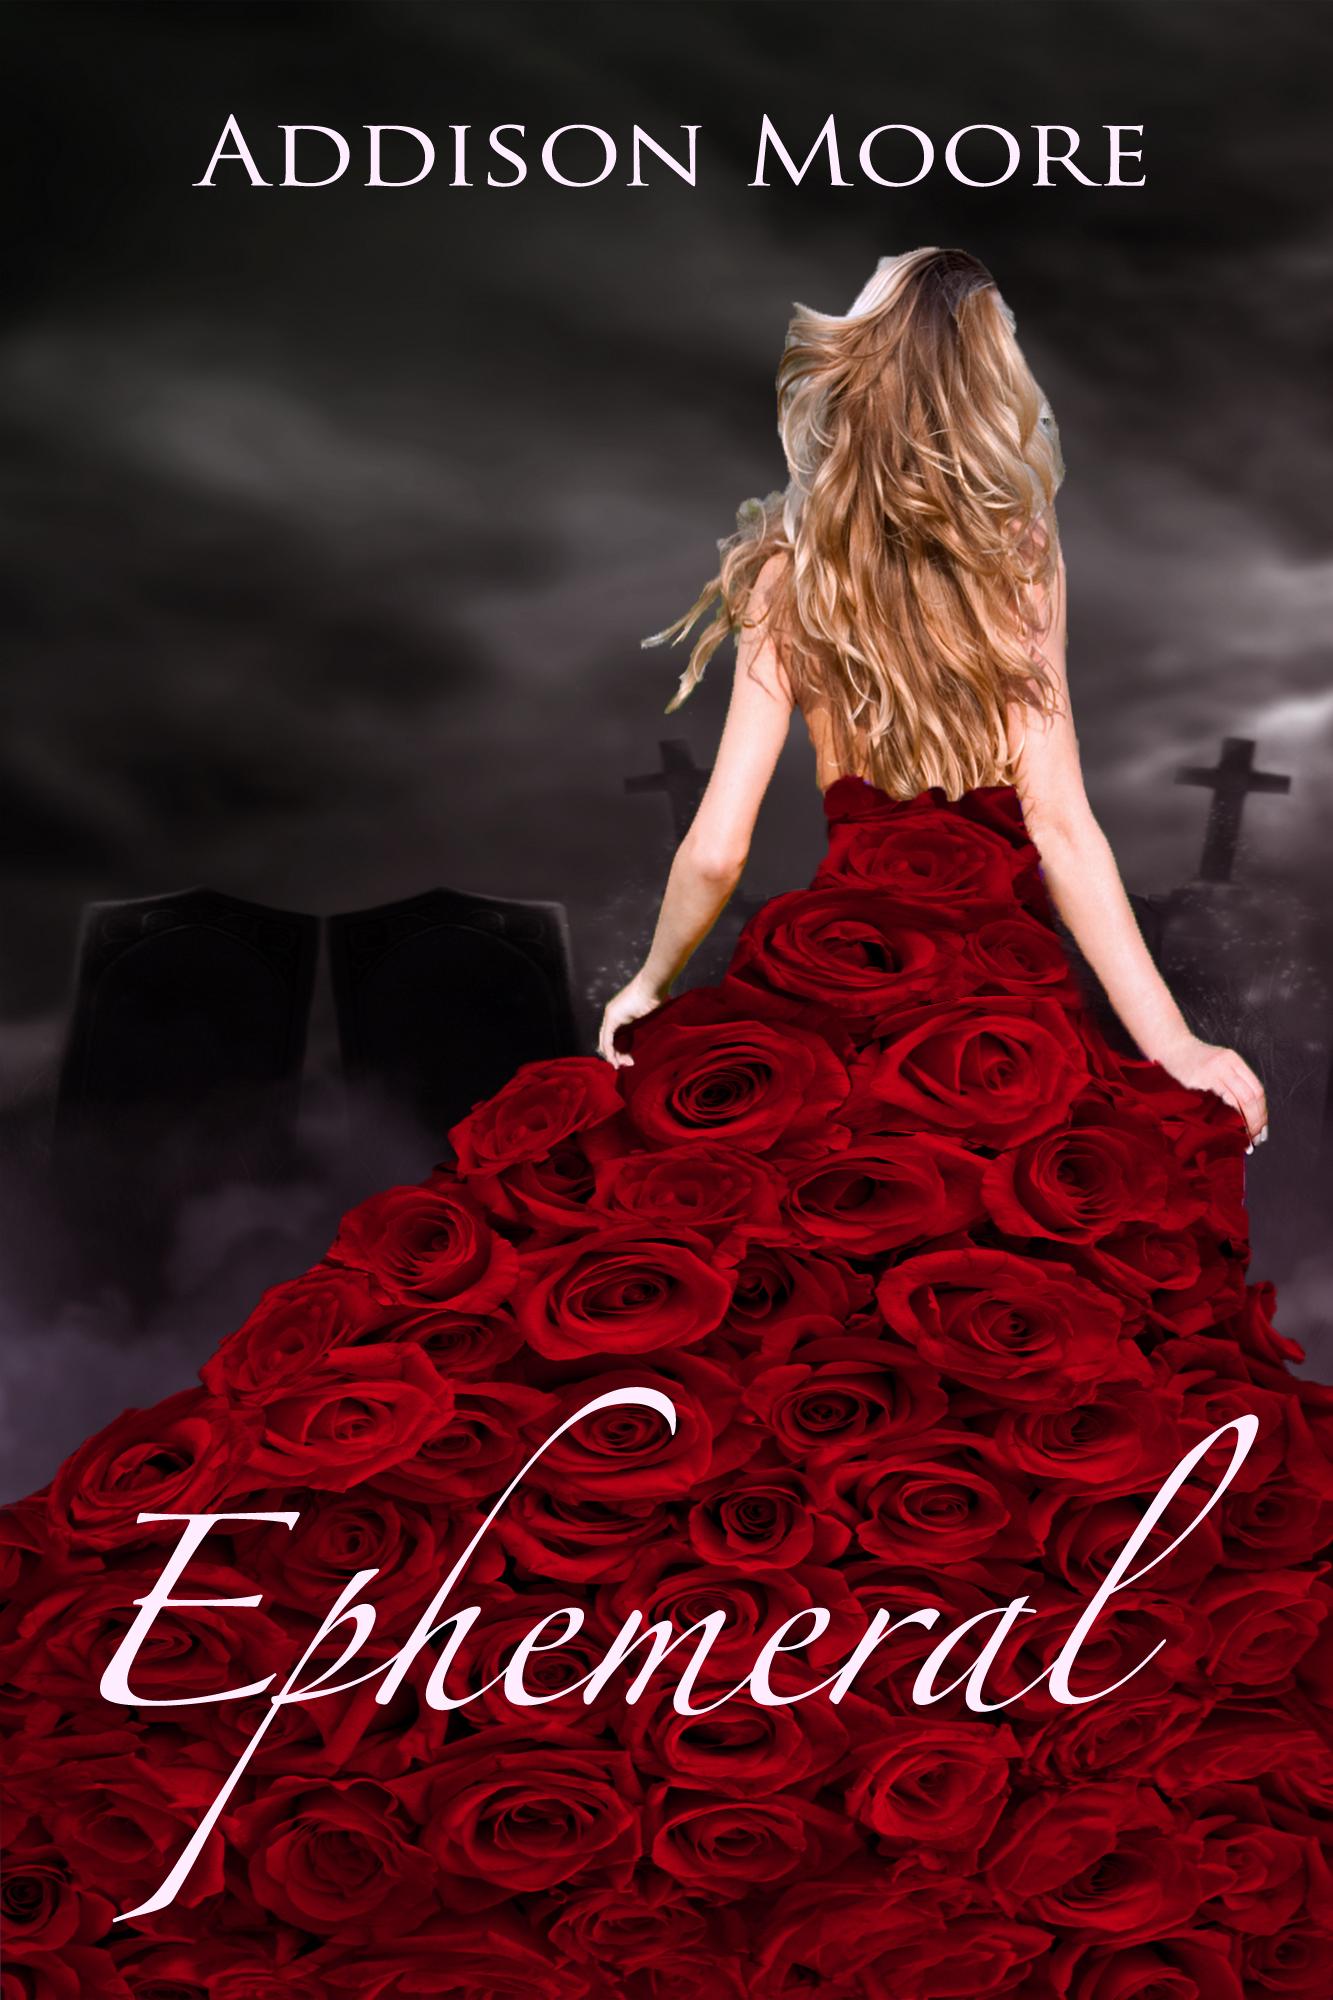 Addison Moore - Ephemeral (The Countenance)